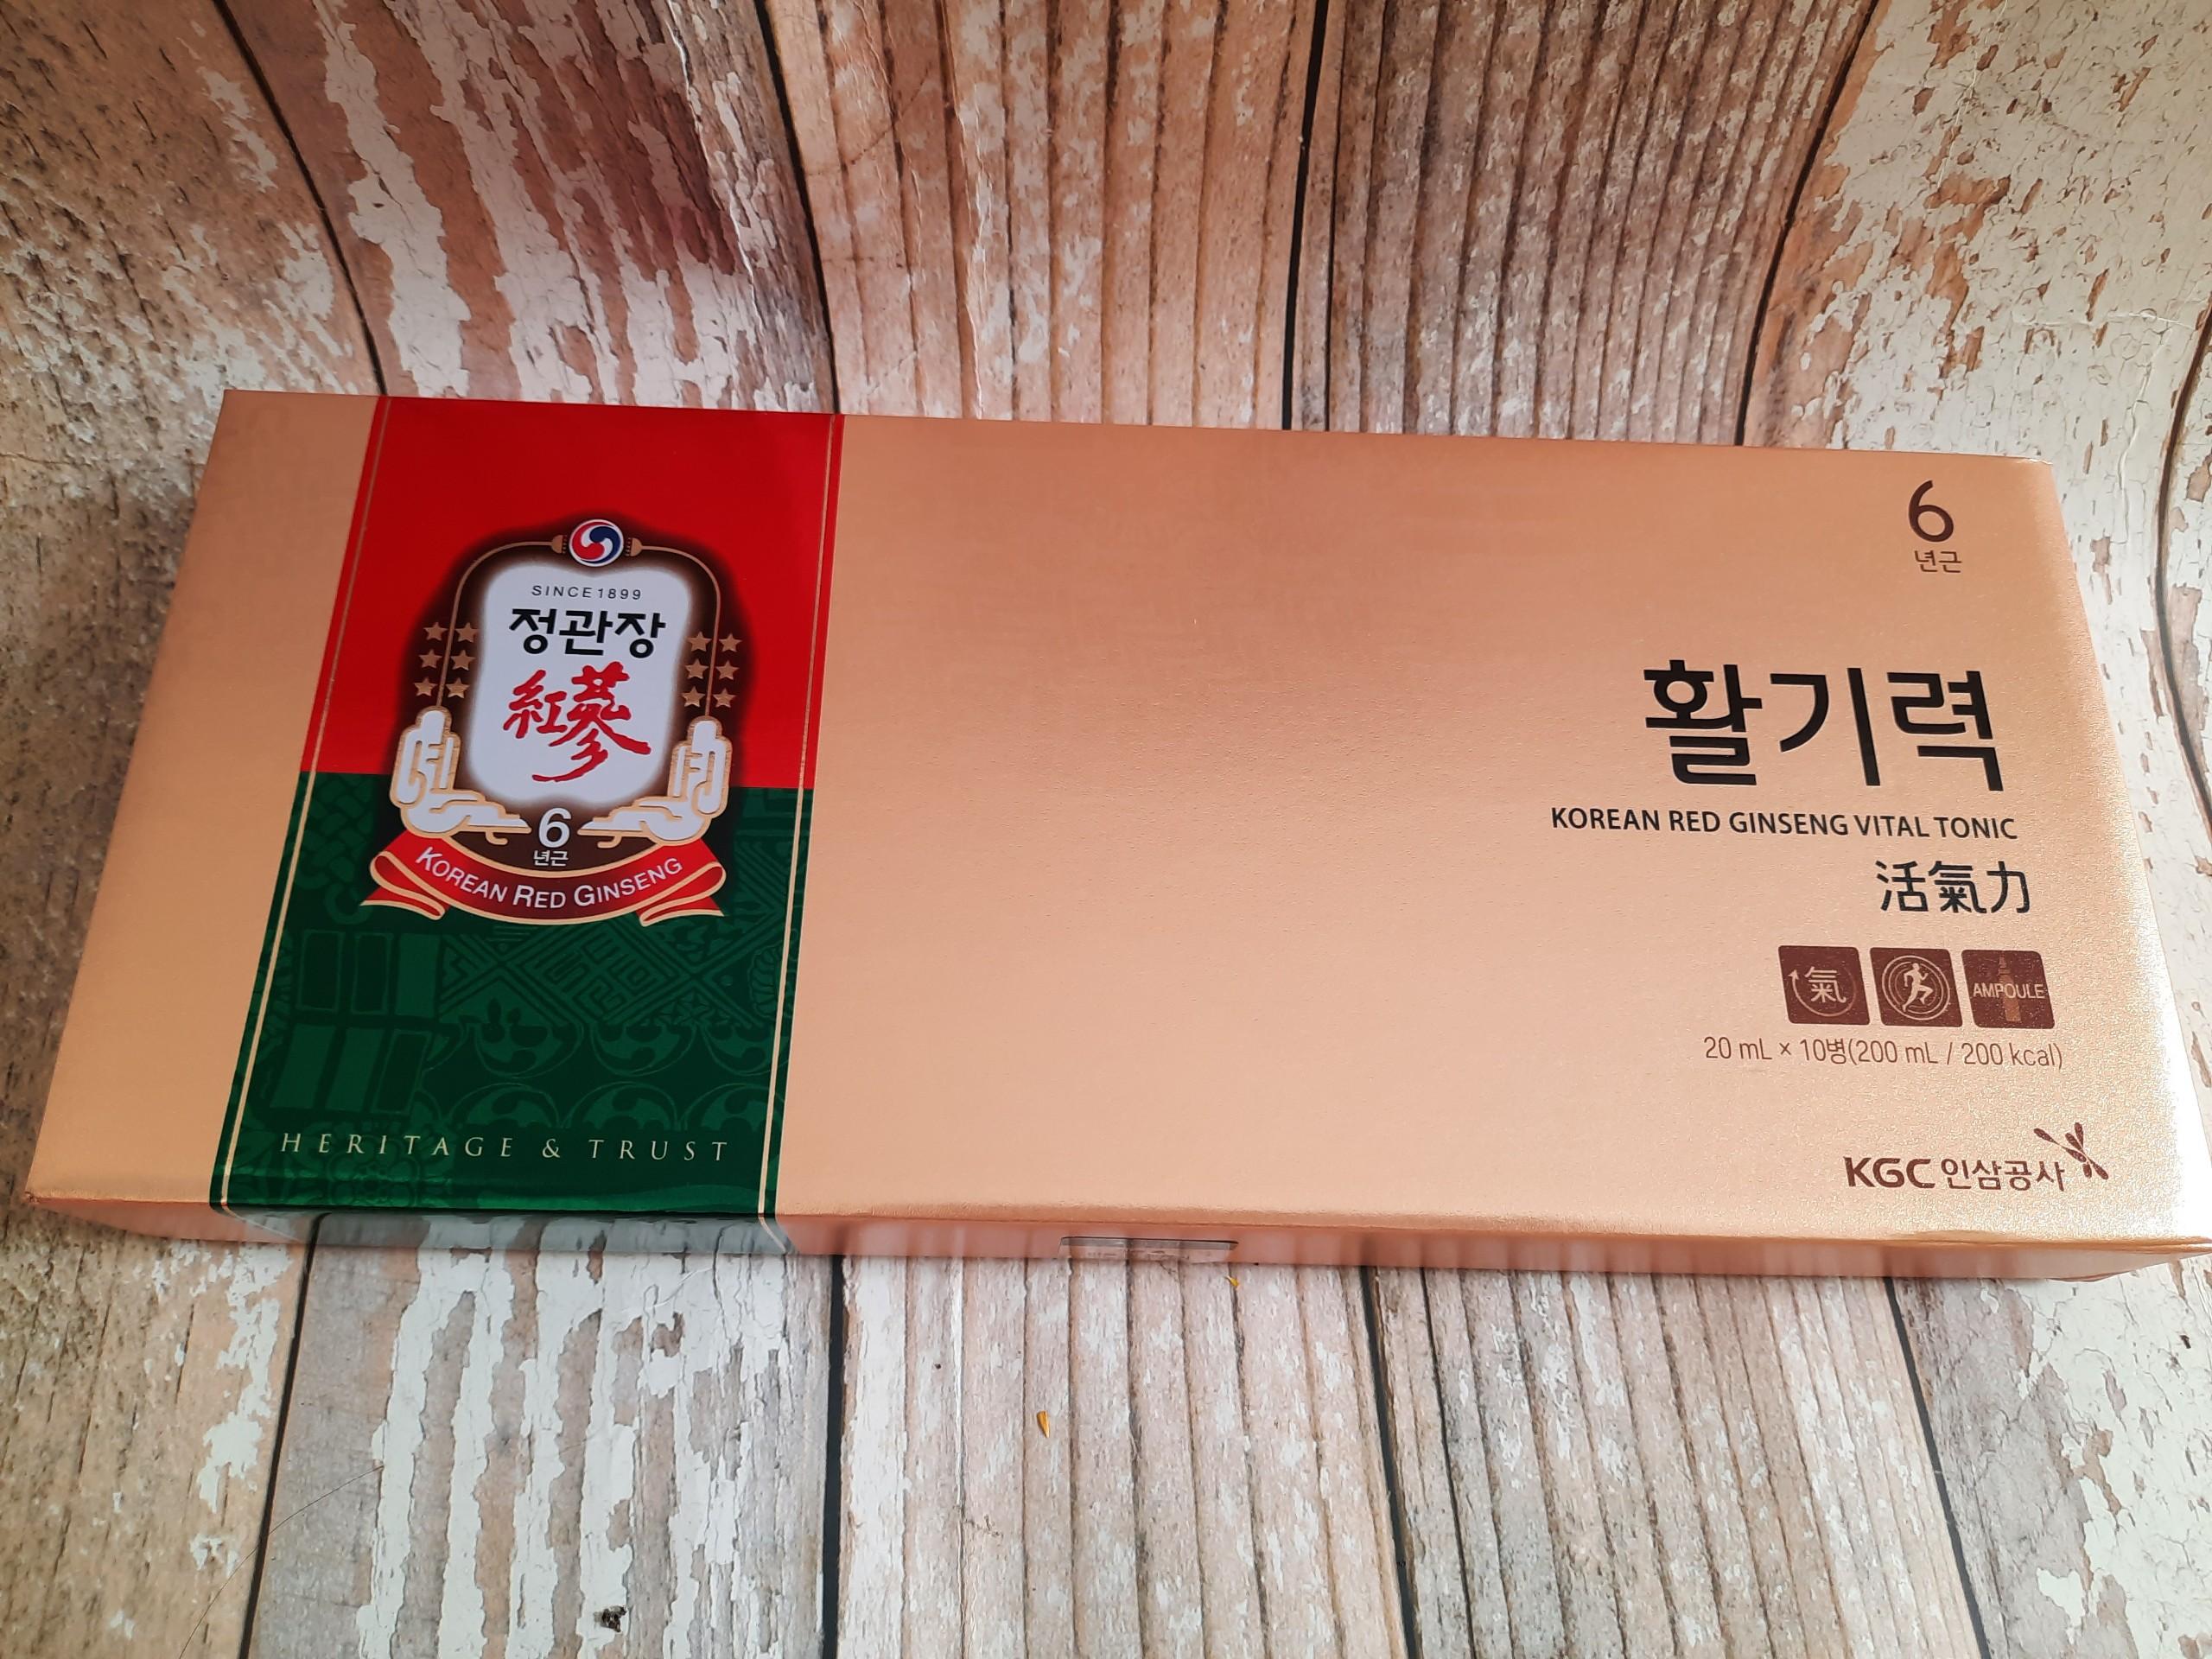 Nuớc hồng sâm Vital Tonic KGC ( Korea Red Ginseng Vital Tonic) Cheong Kwan Jang 10 ống x 20ml